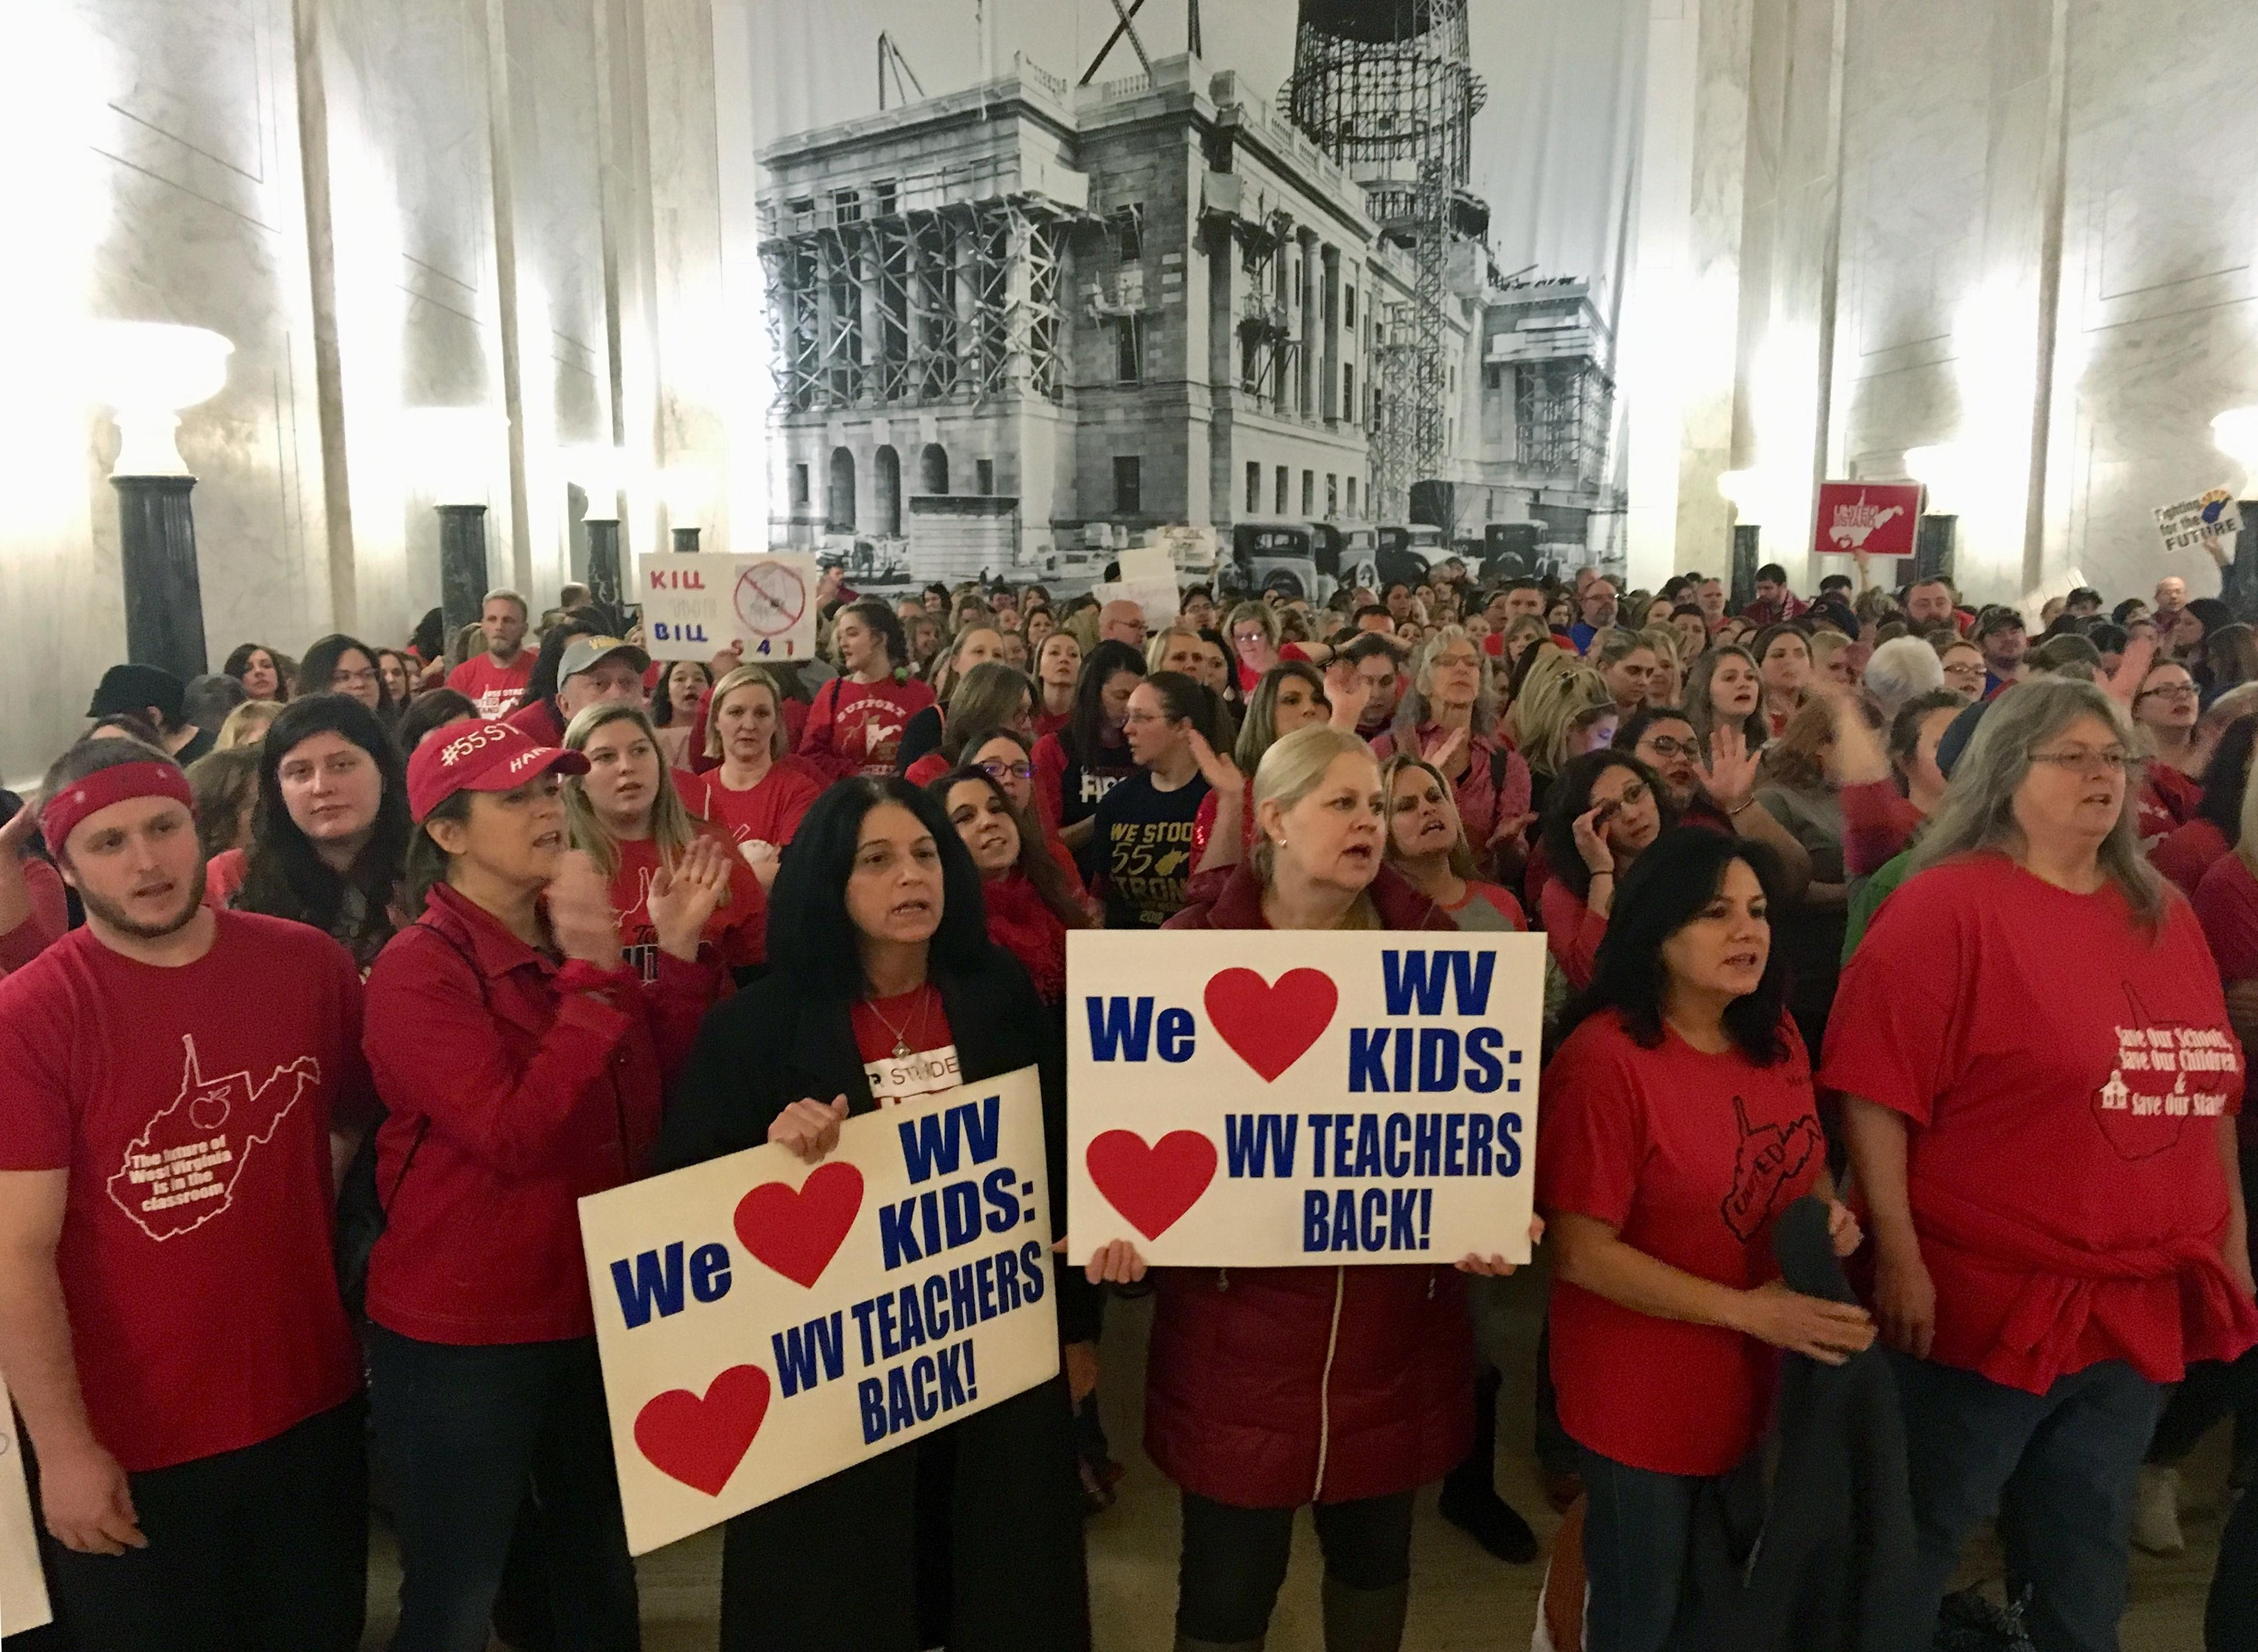 Strike 2: West Virginia teachers walk out again | The Spokesman-Review